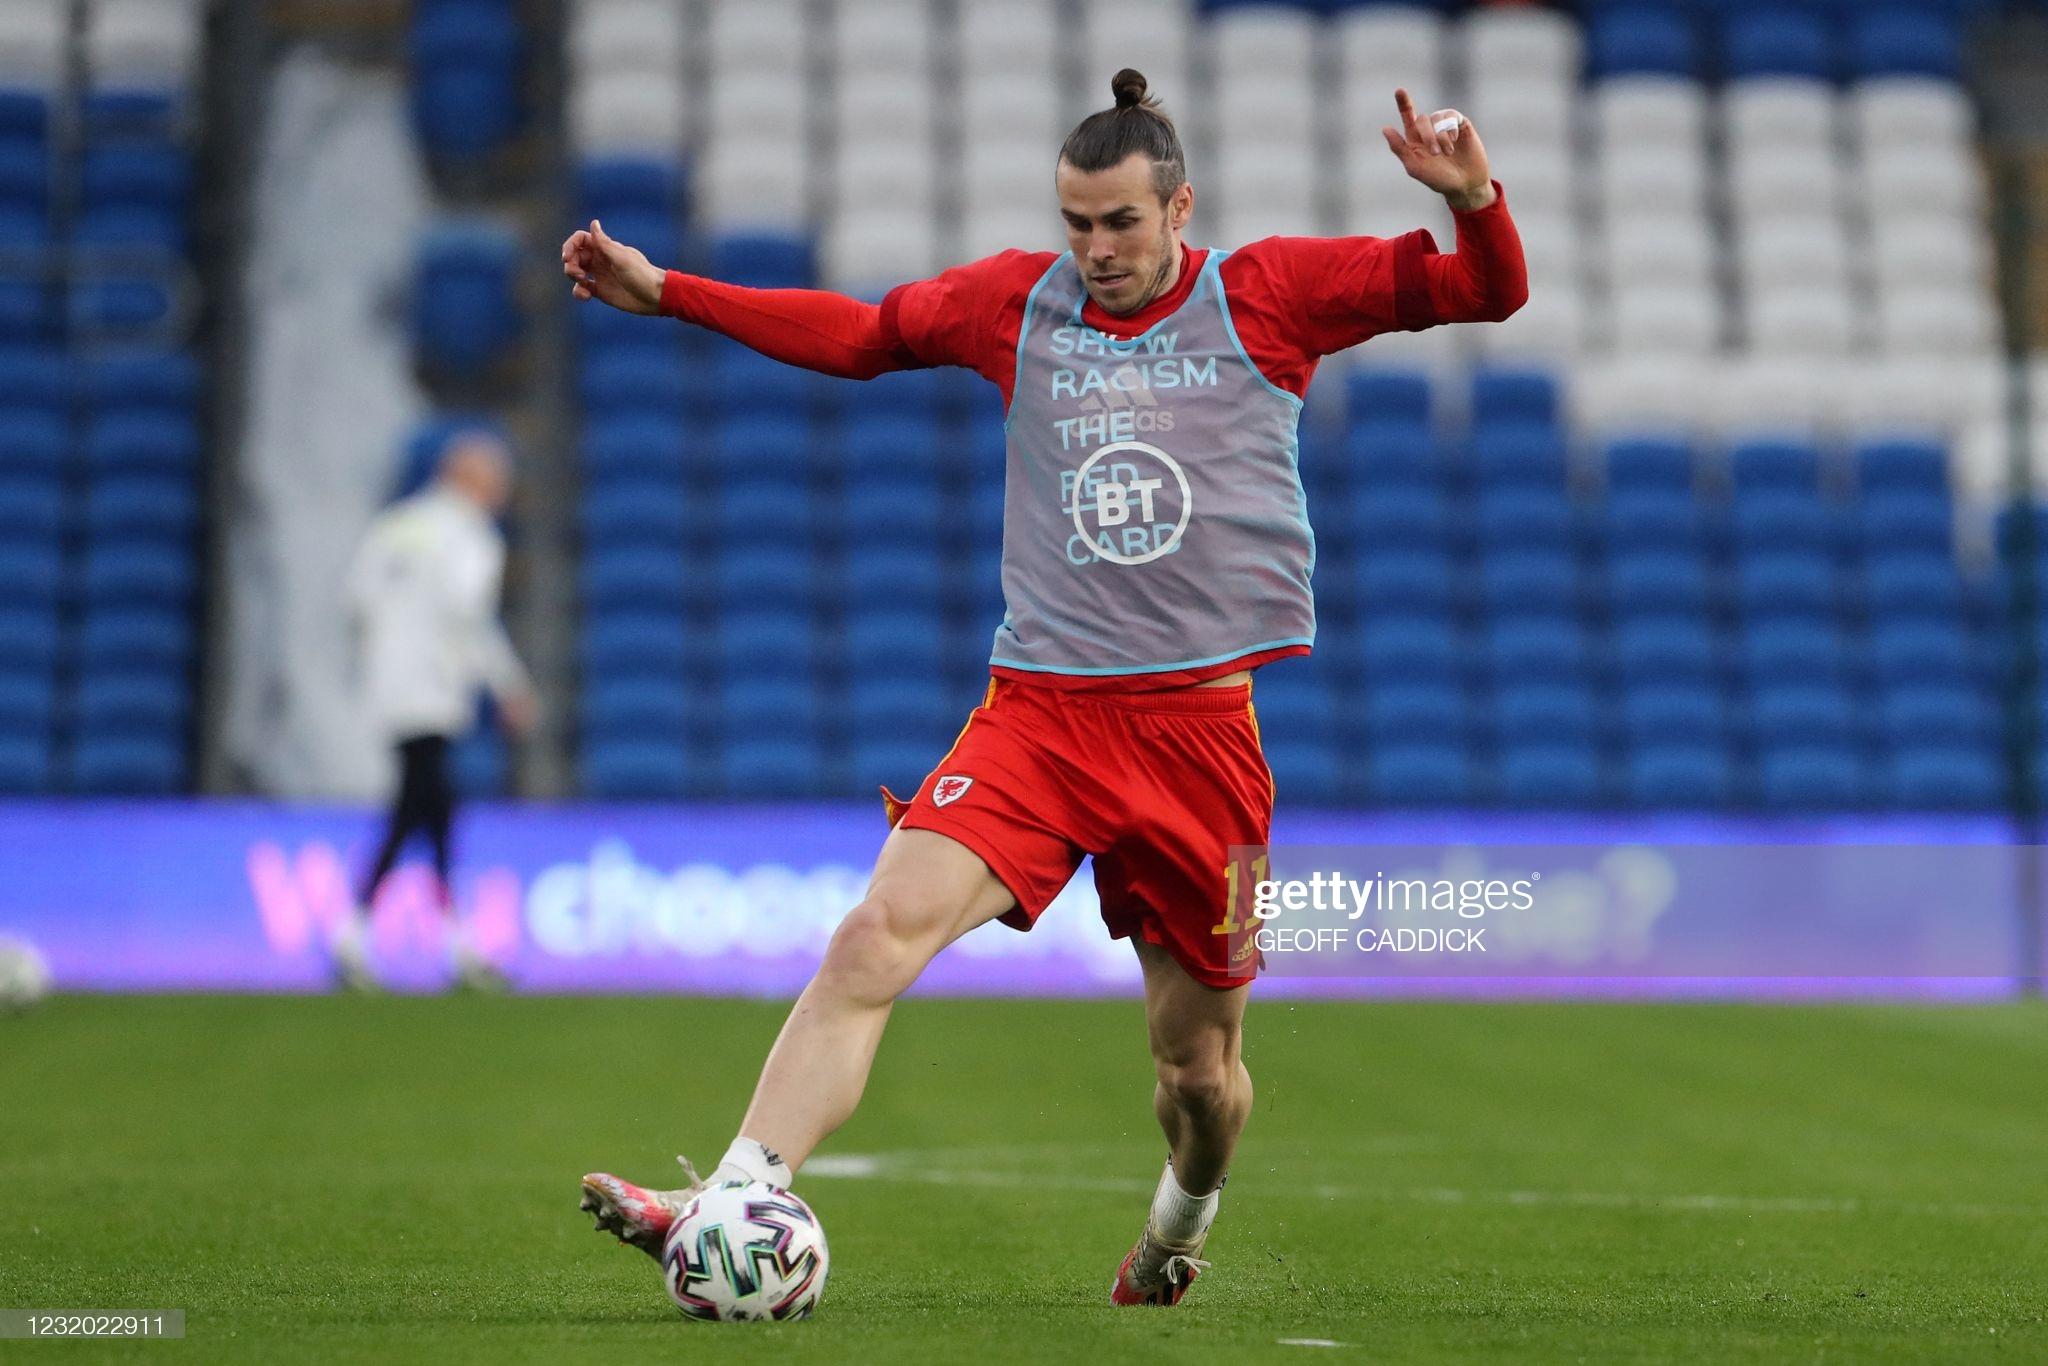 [Image: Wales-midfielder-Gareth-Bale-warms-up-ah...otball.jpg]